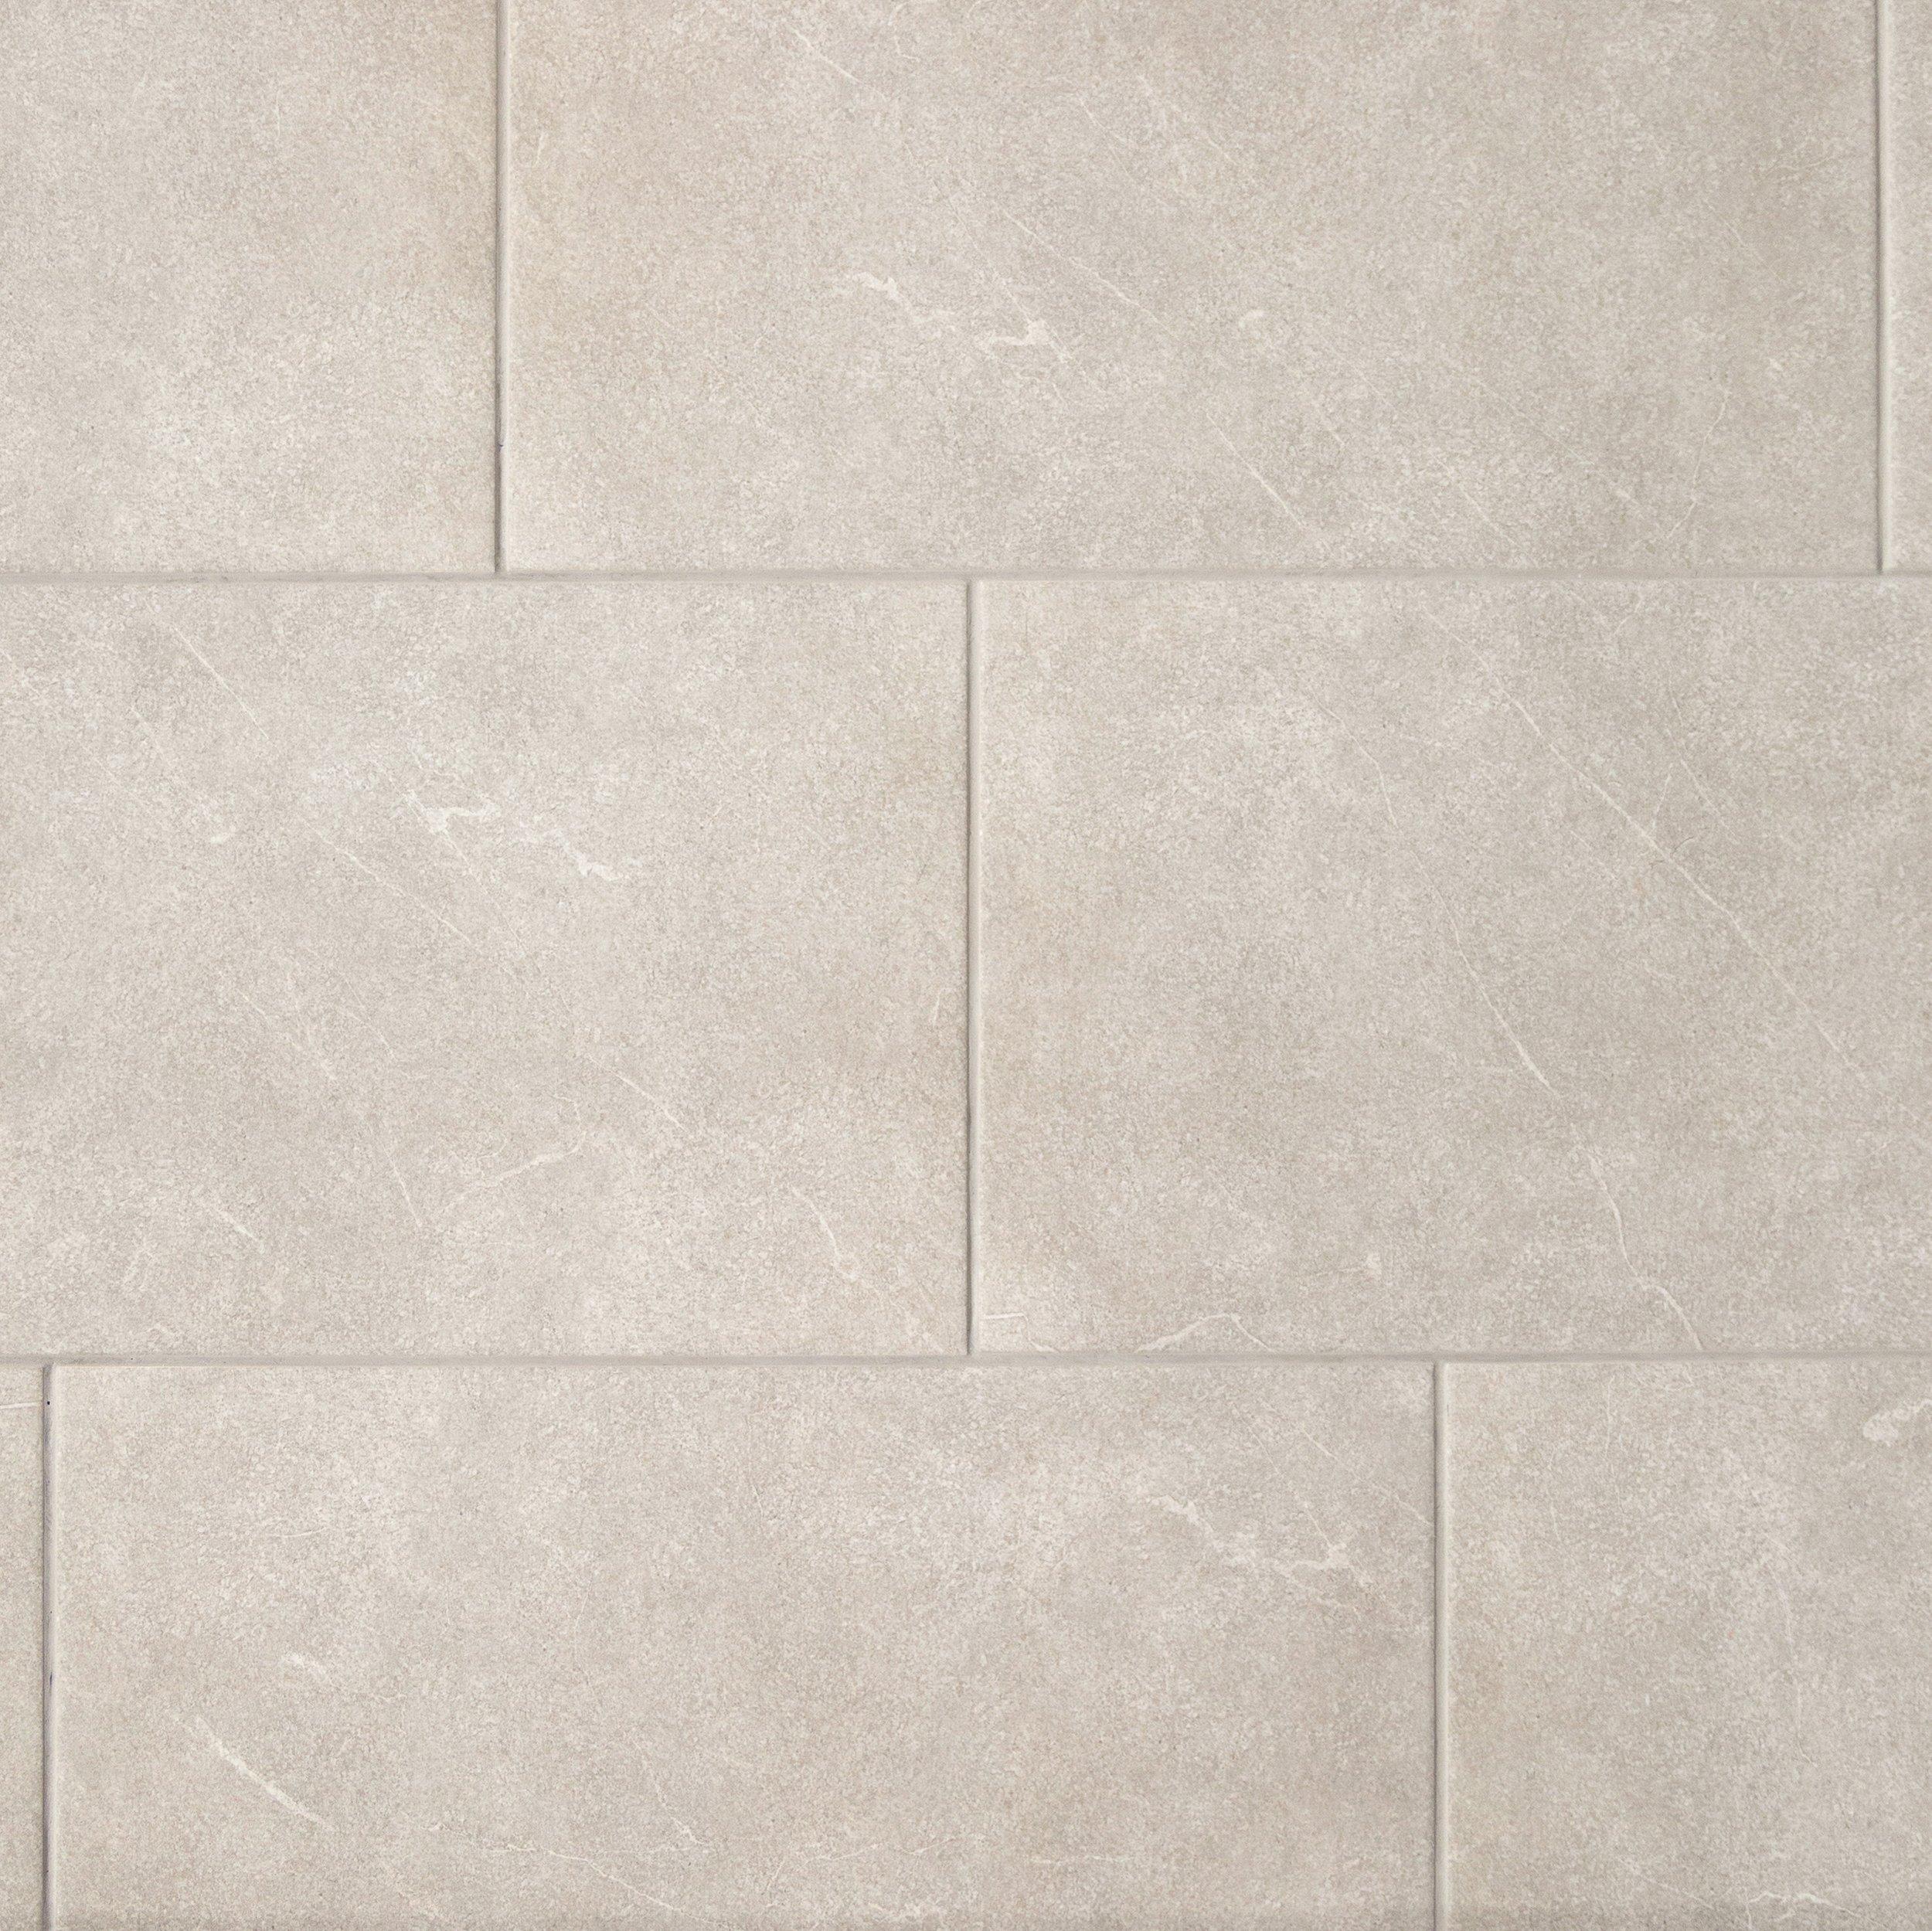 Concrete Gray Ceramic Tile - 12 X 24 - 100136795